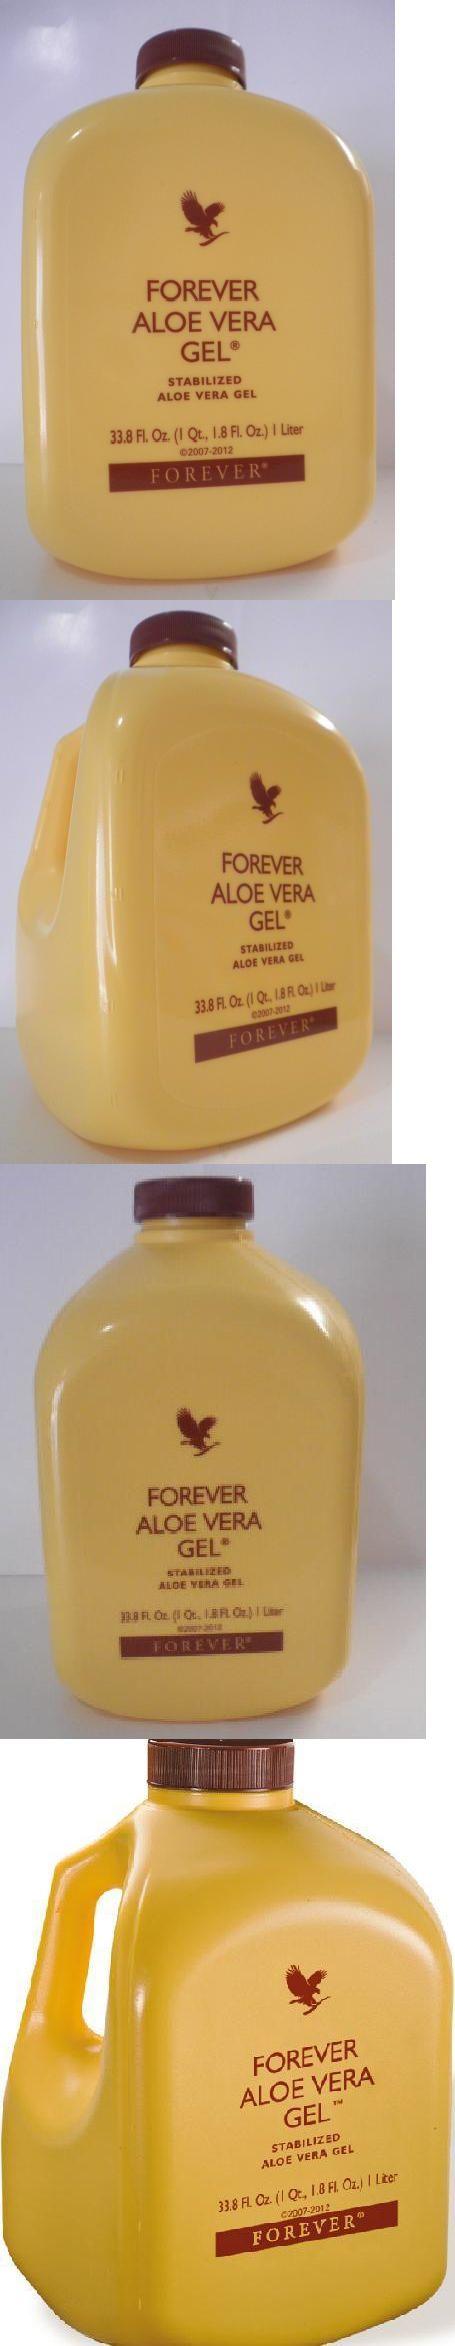 Fruit Juices 179176: 3X Forever Aloe Vera Gel (33.8Fl.Oz Each) -> BUY IT NOW ONLY: $54.75 on eBay!